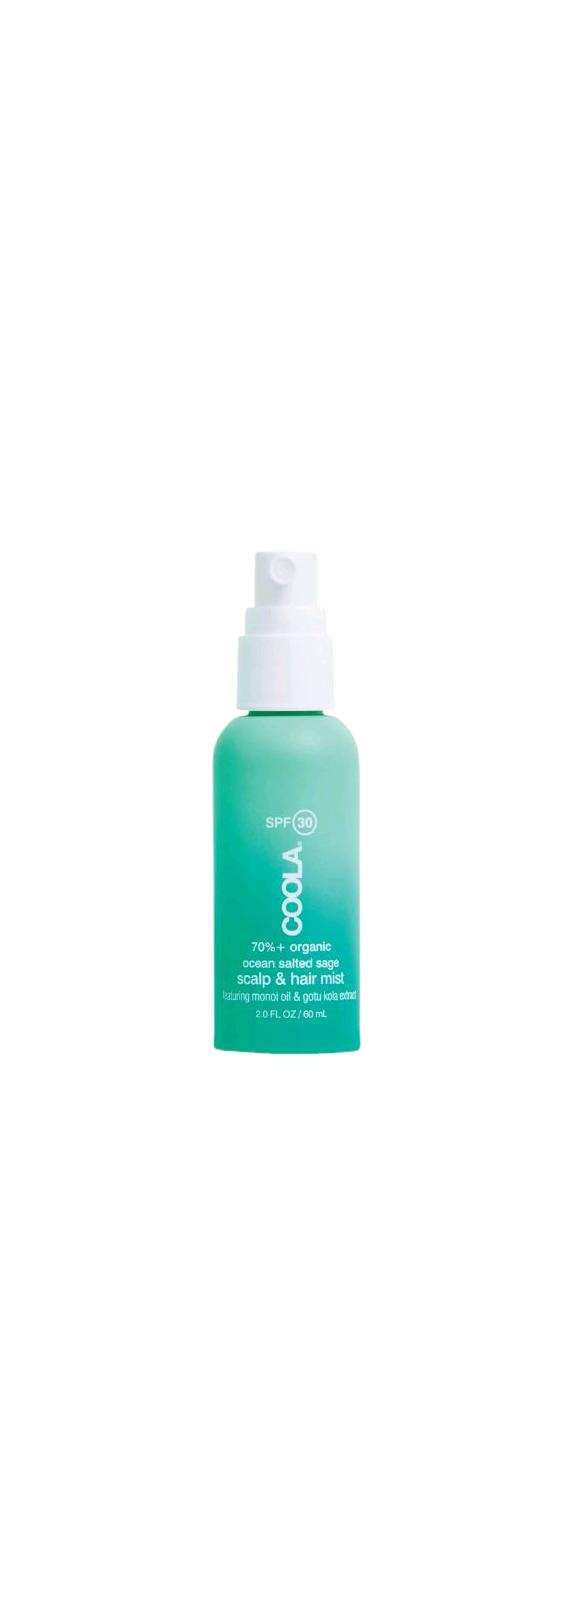 Coola - Classic Organic Scalp & Hair Mist SPF 30 - 59 ml